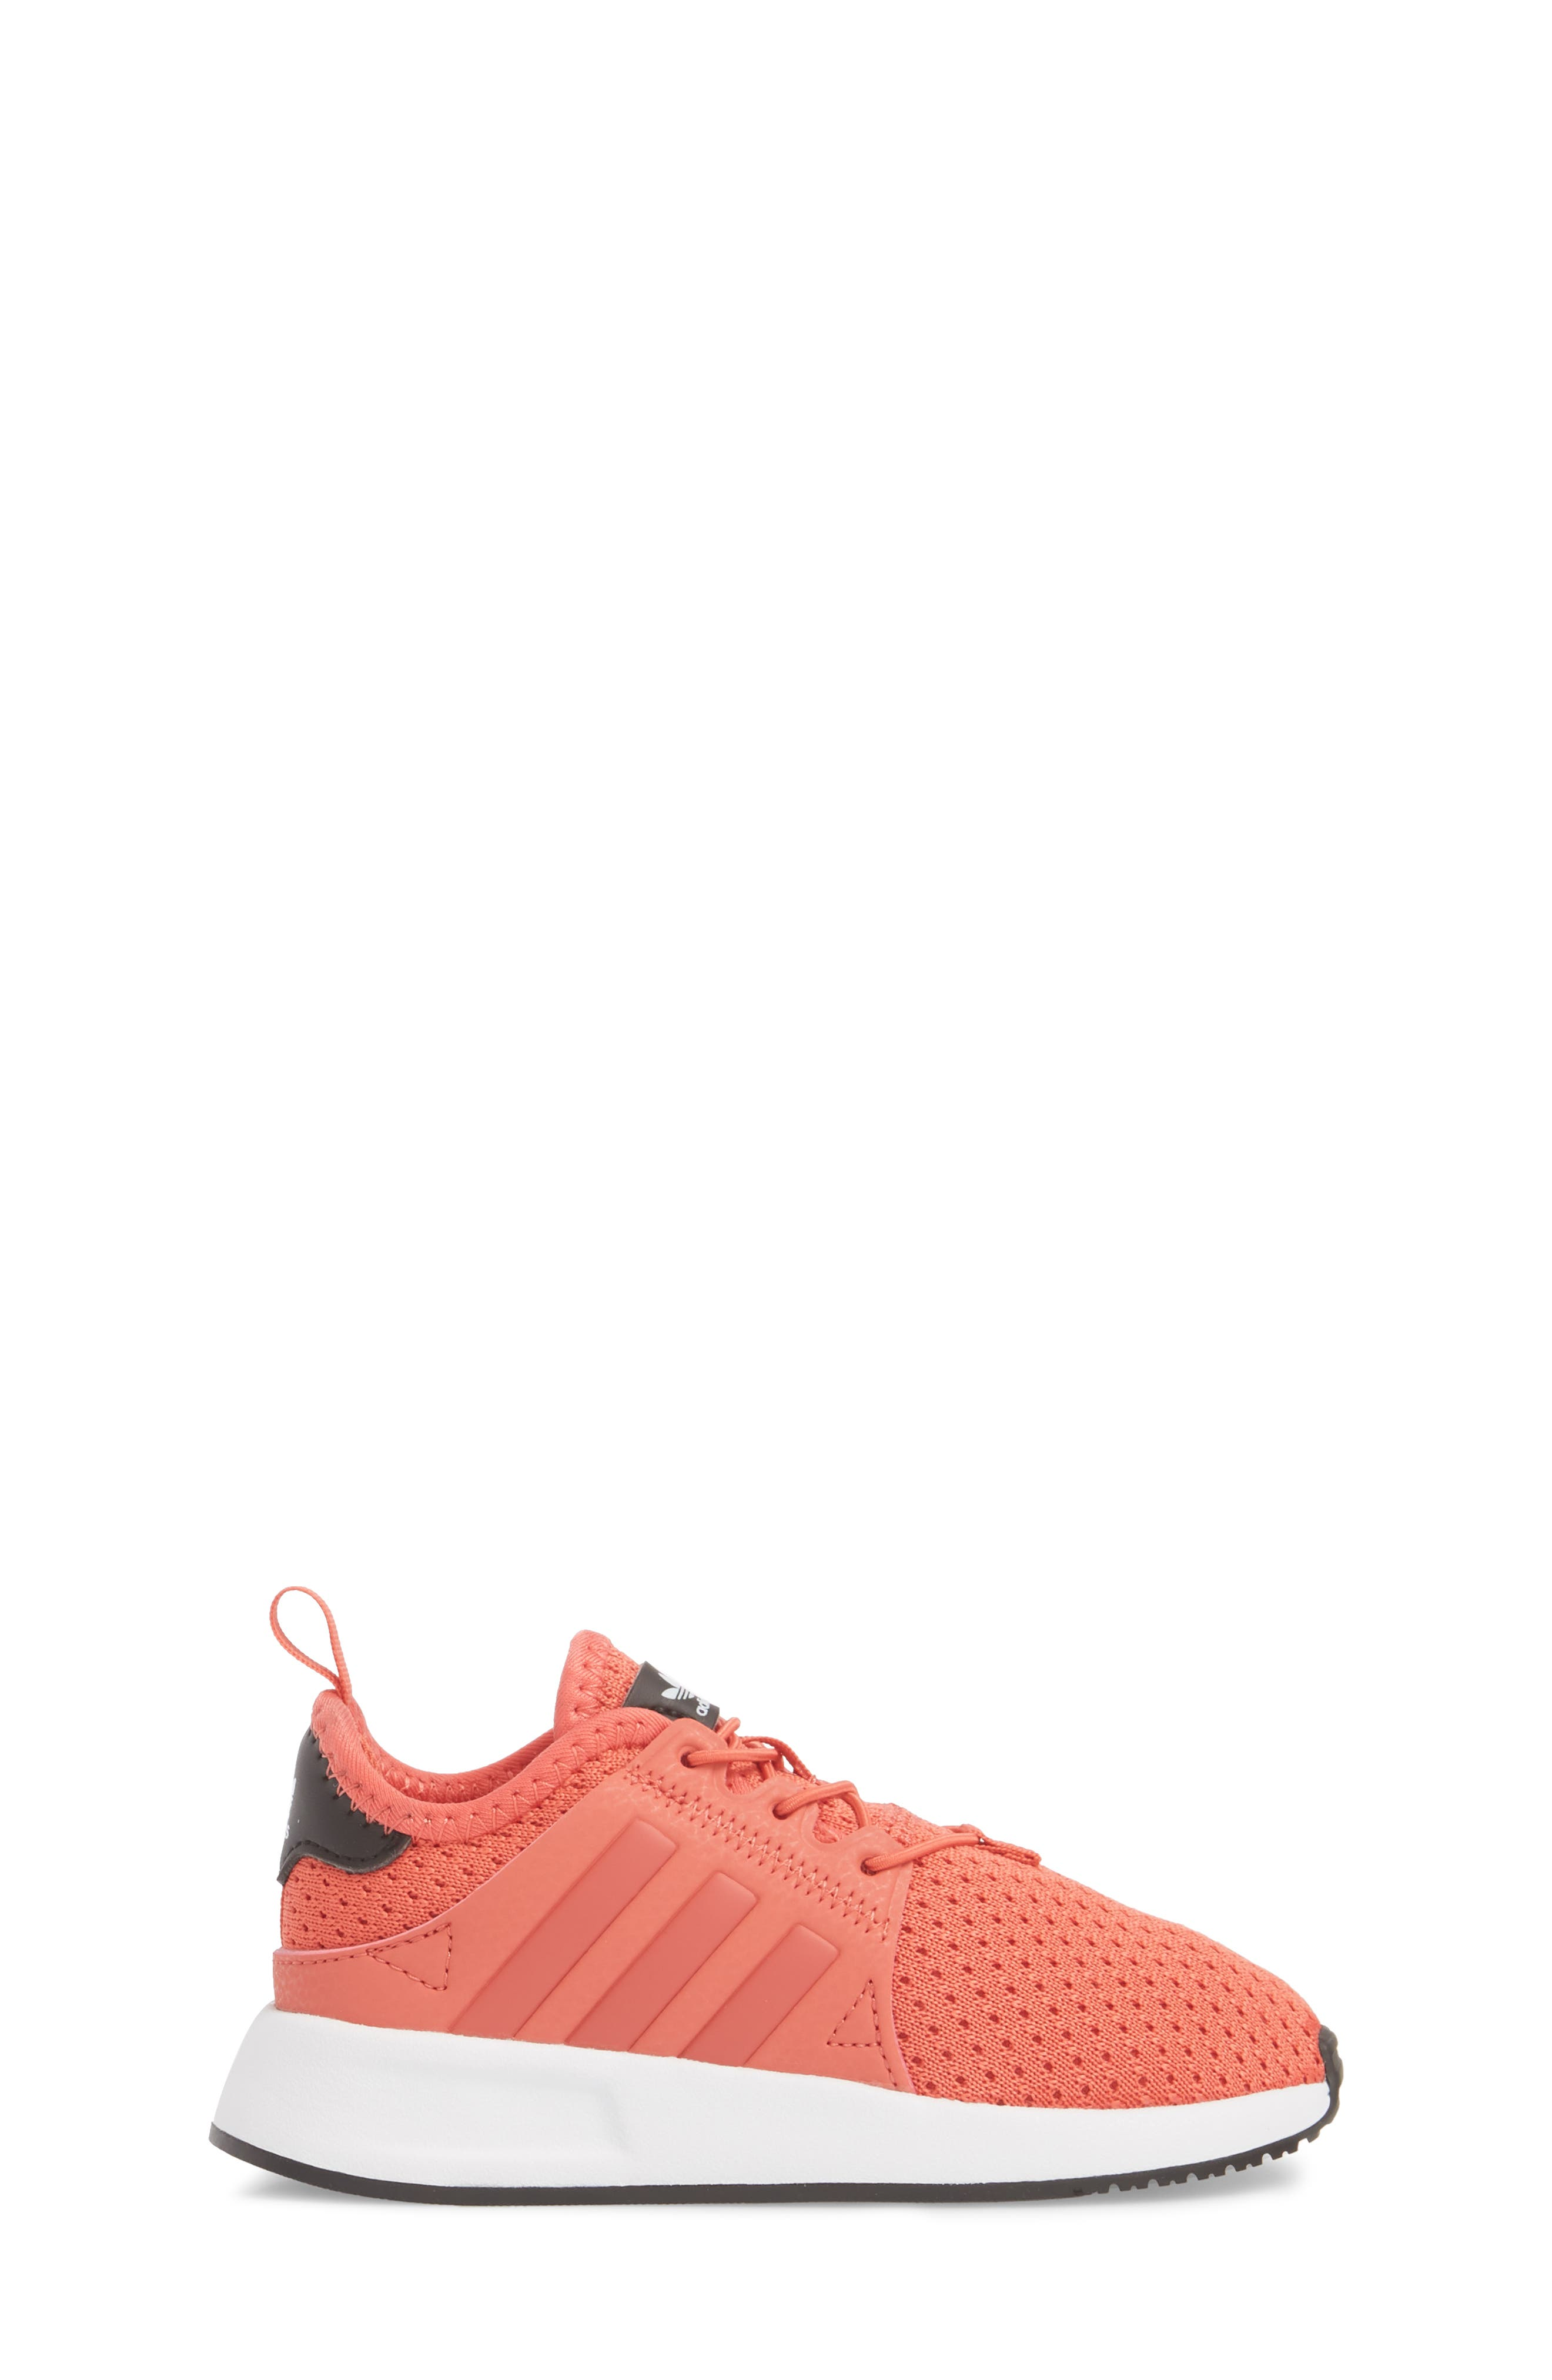 X_PLR Sneaker,                             Alternate thumbnail 5, color,                             Trace Scarlet/ White